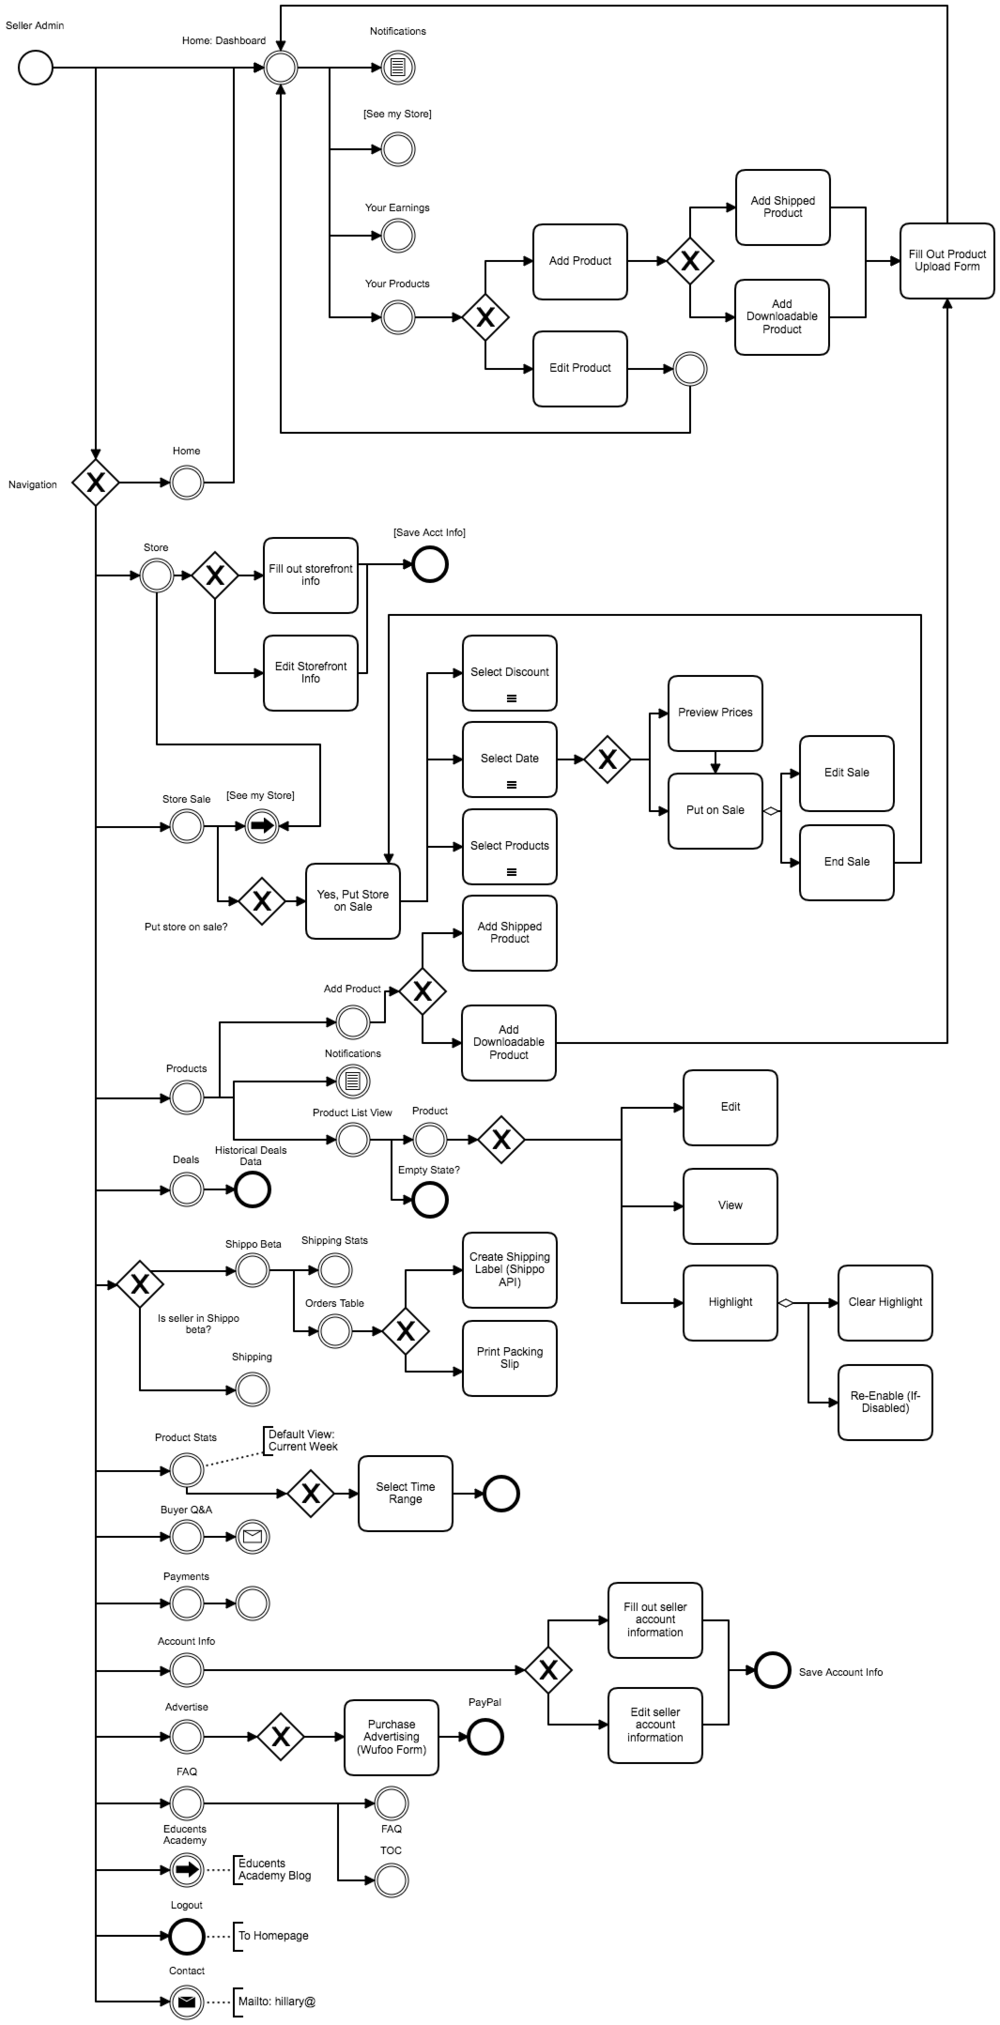 Existing Dashboard IA